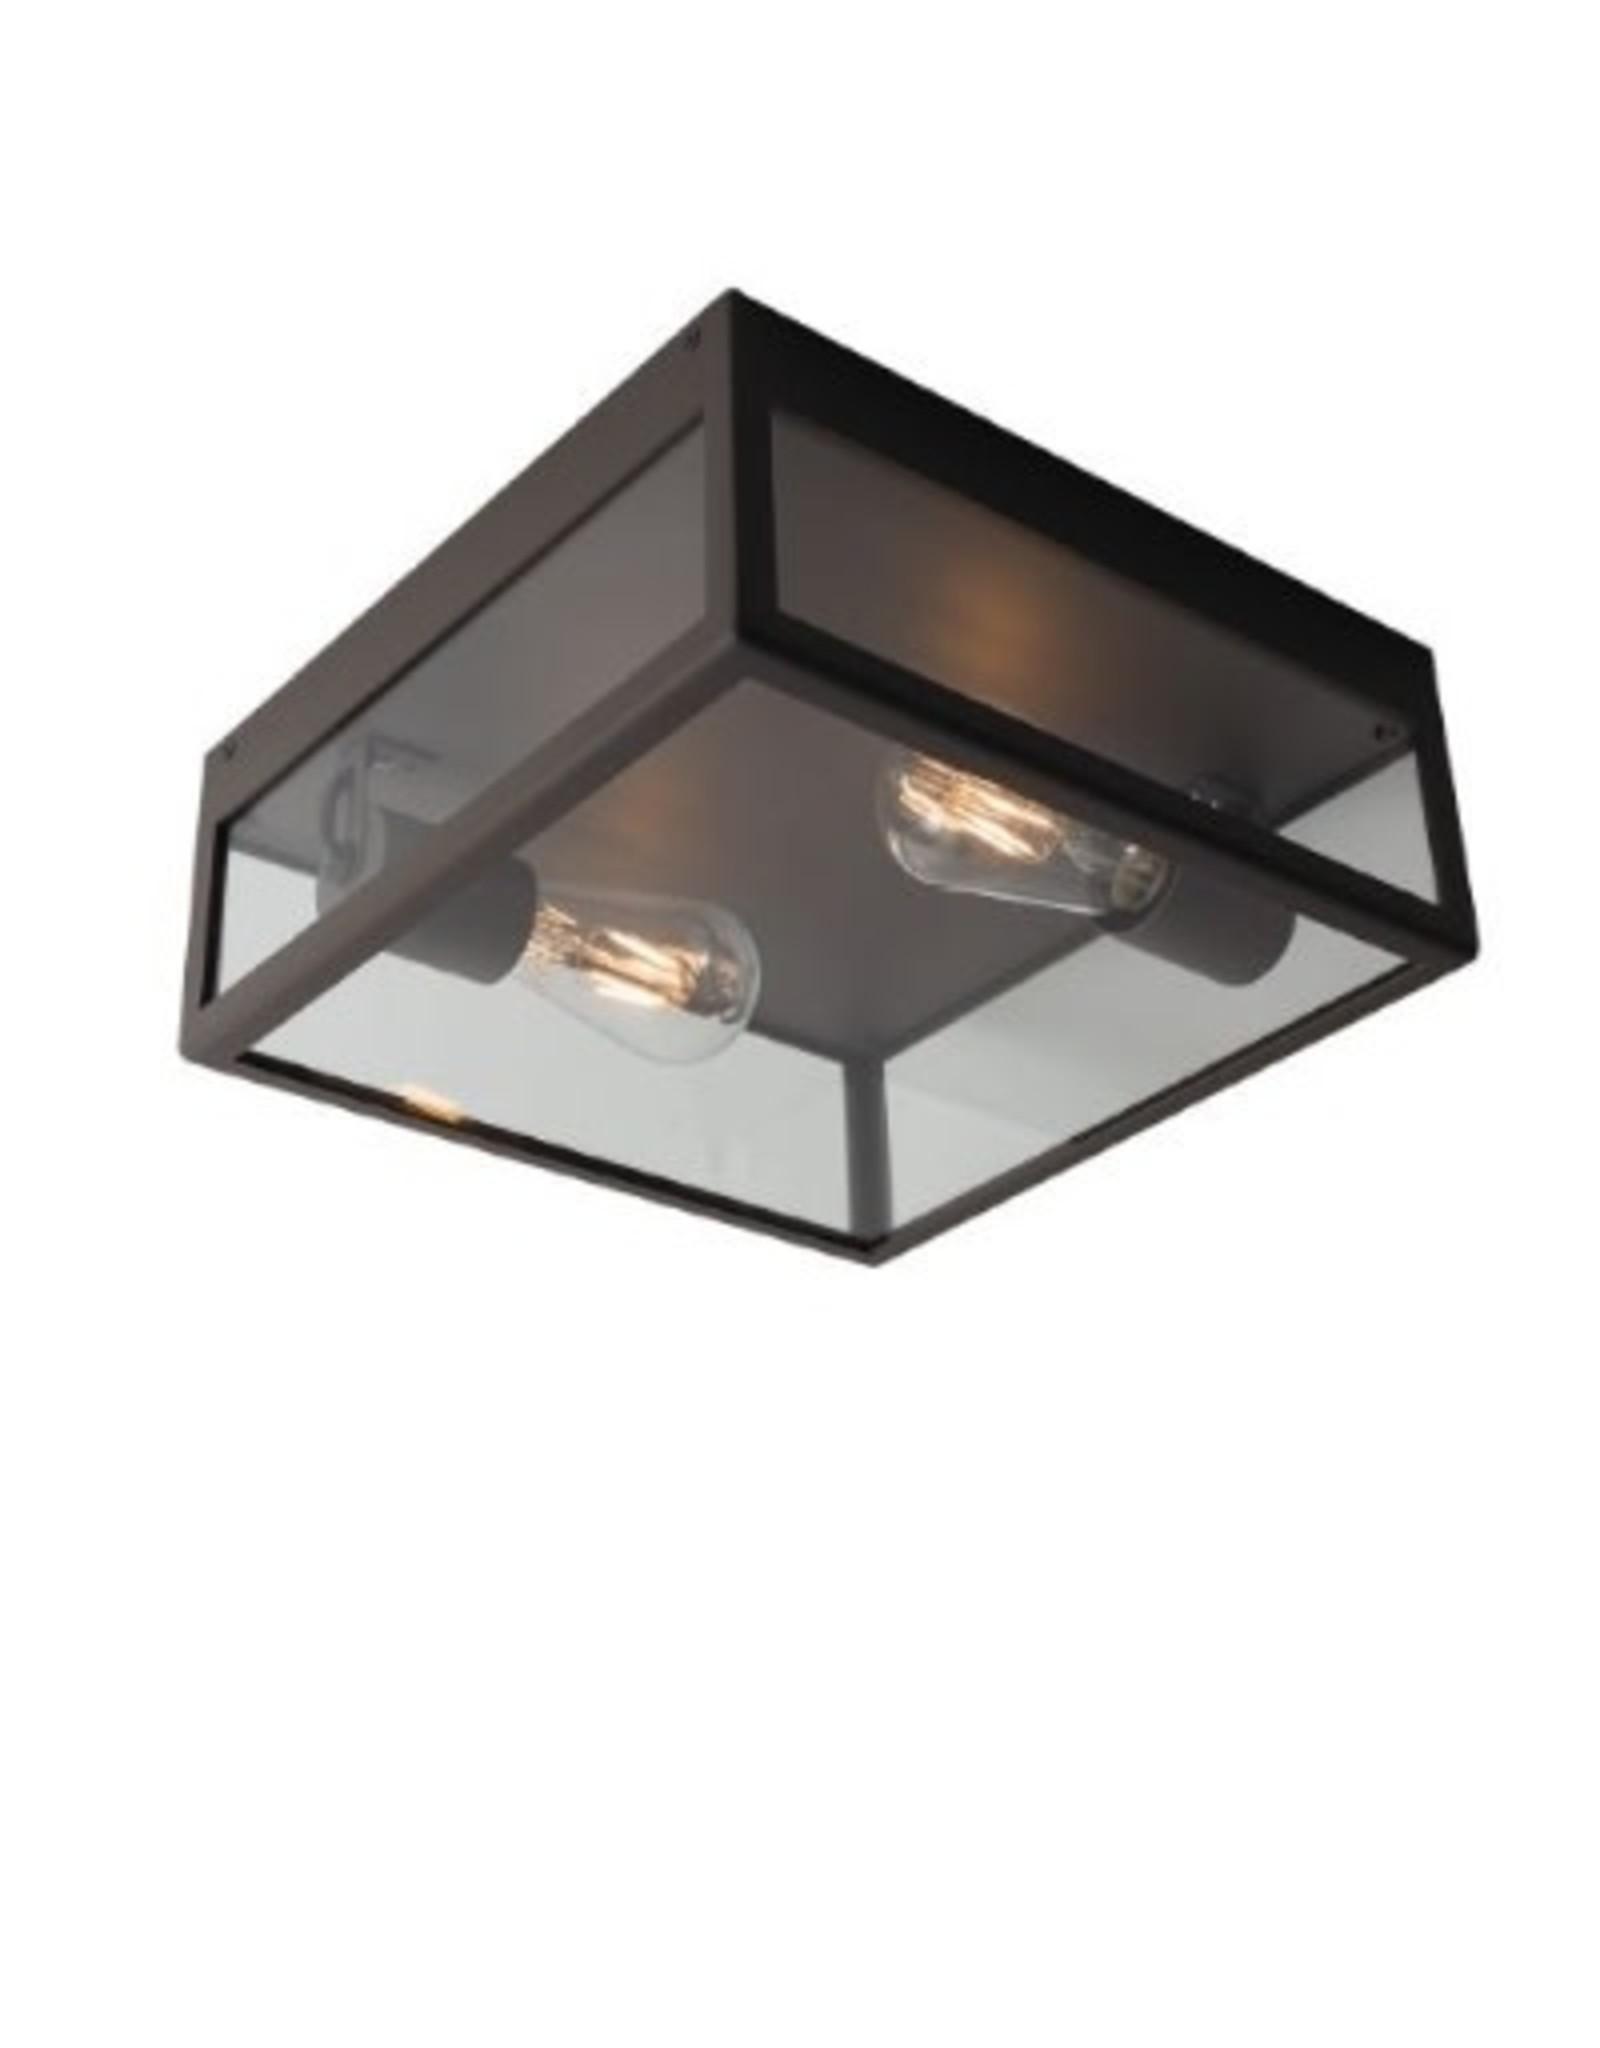 psm lighting POLO opbouw plafondverlichting E27 60W IP44 L320xB320xH128 zwart textuur